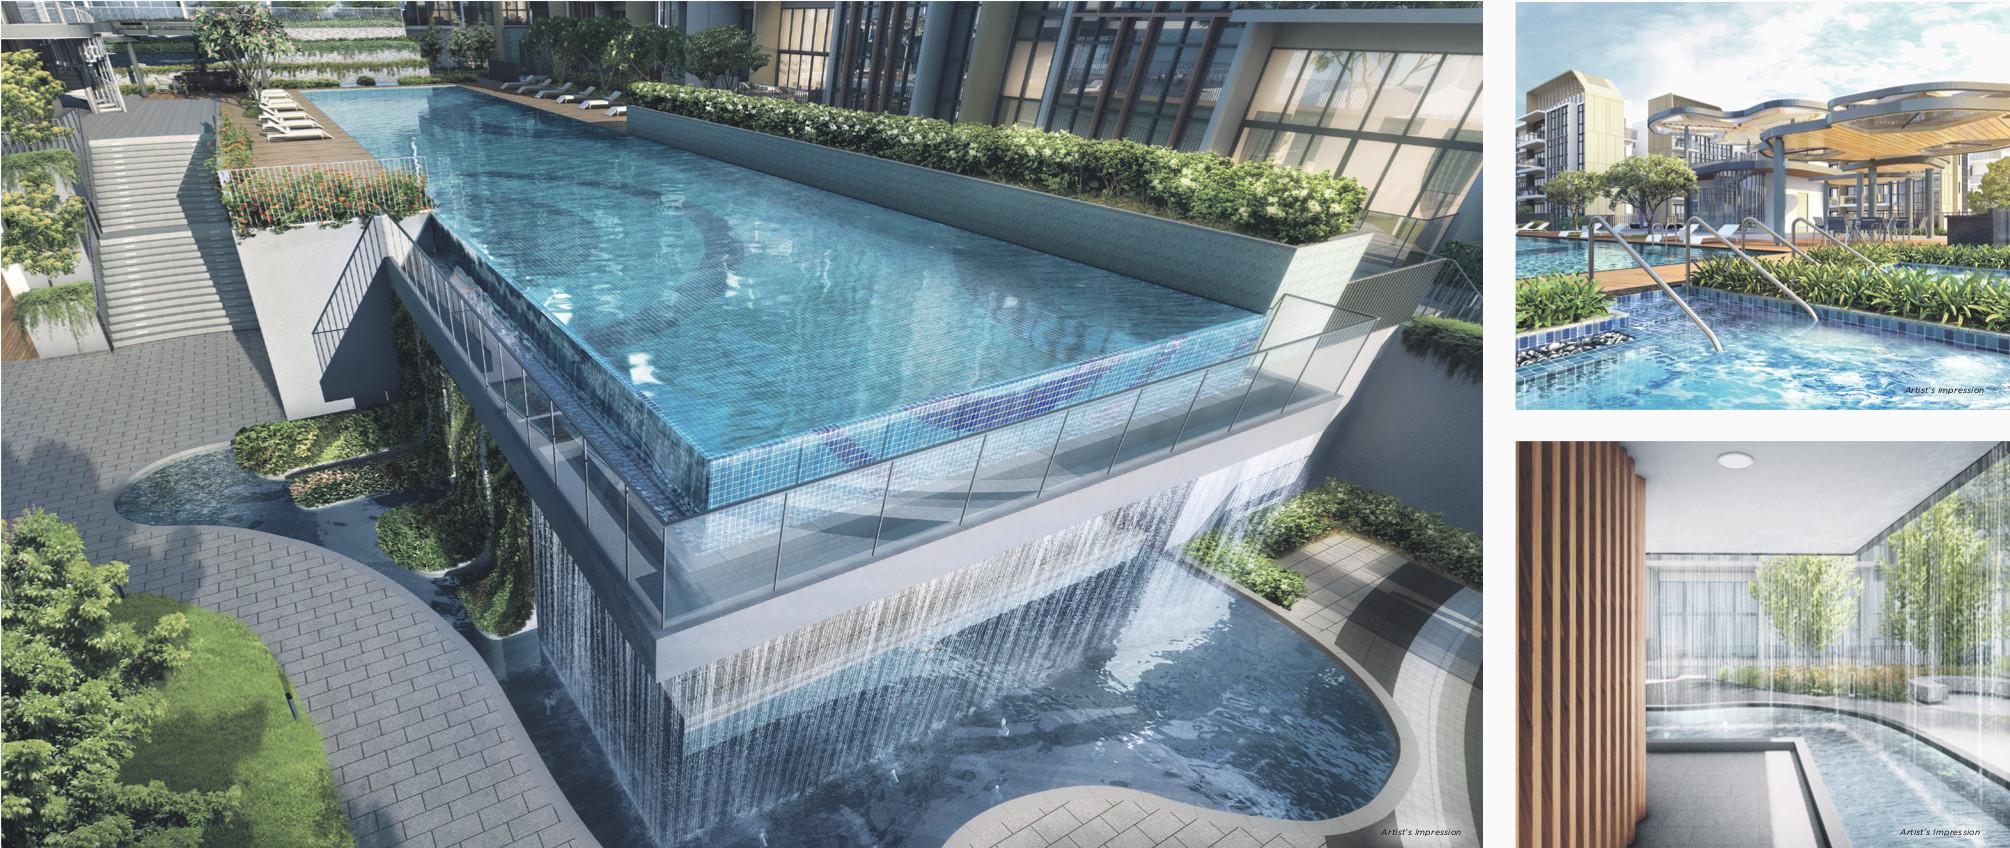 Artist's Impression . Gazania Condo Lap Pool and Aqua Zone